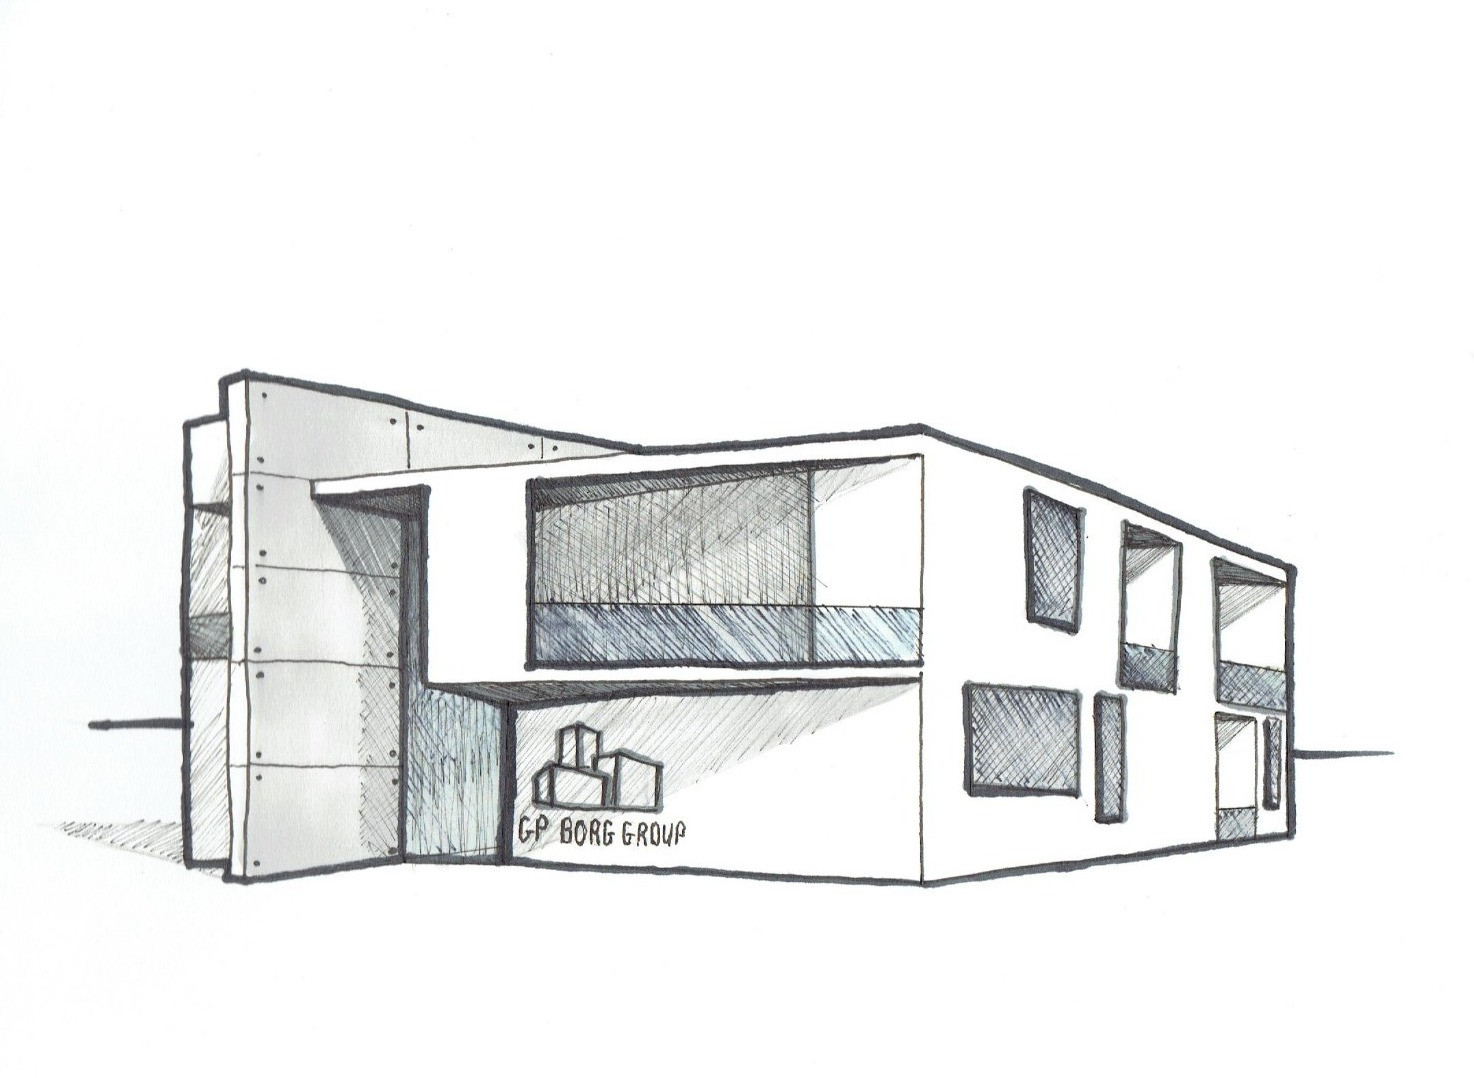 GP Borg Offices